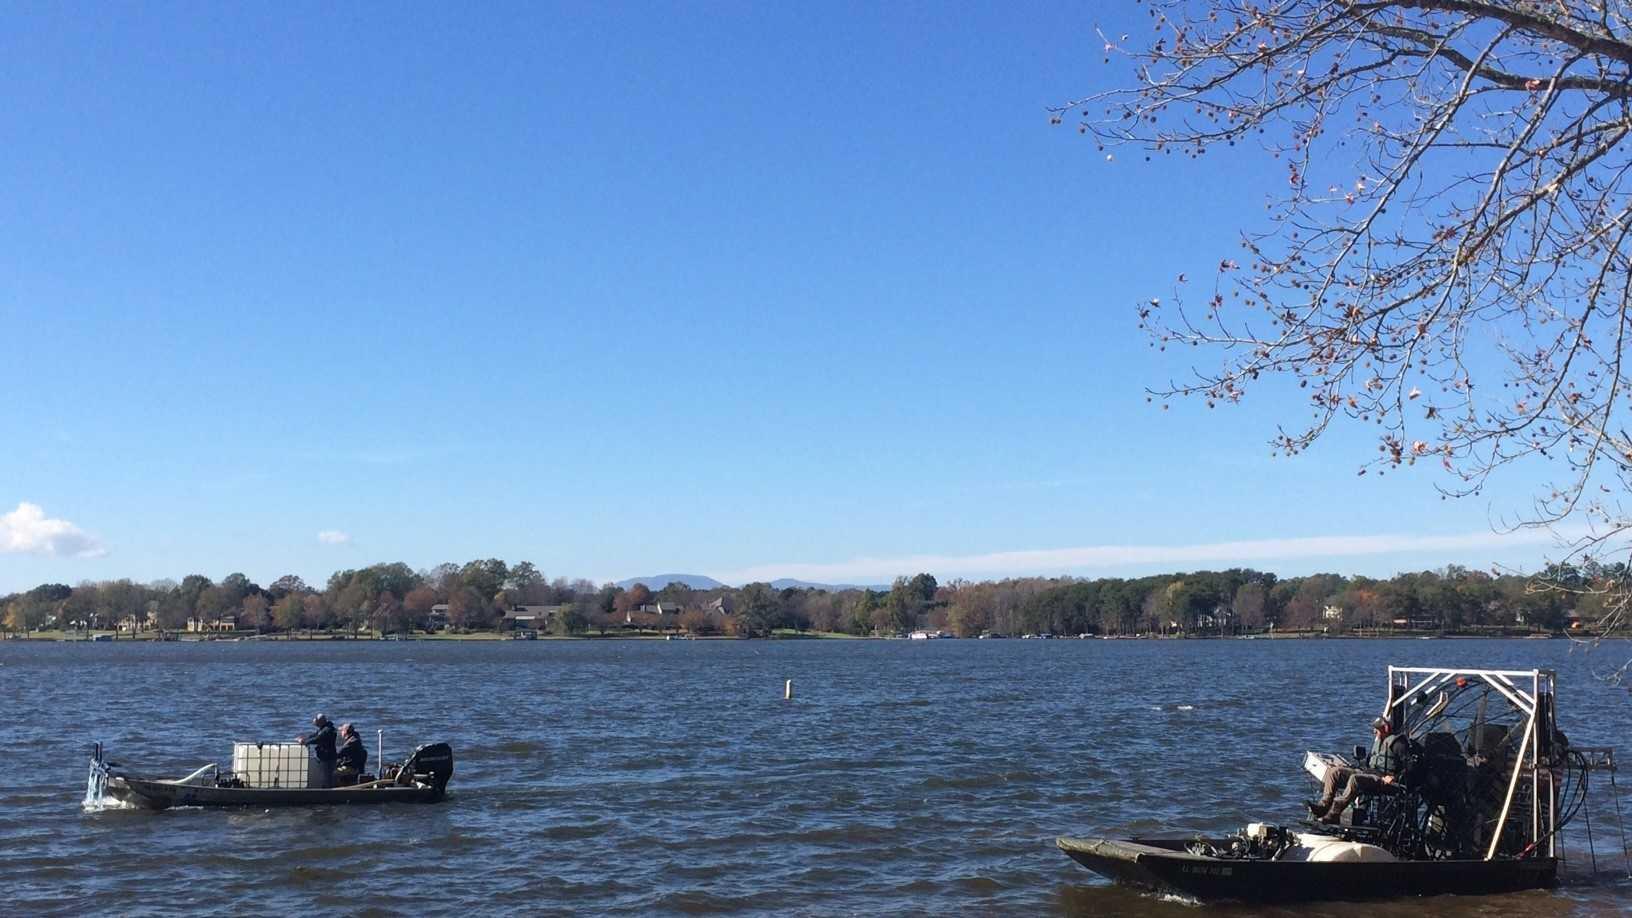 Boats apply algaecide to Lake Bowen.